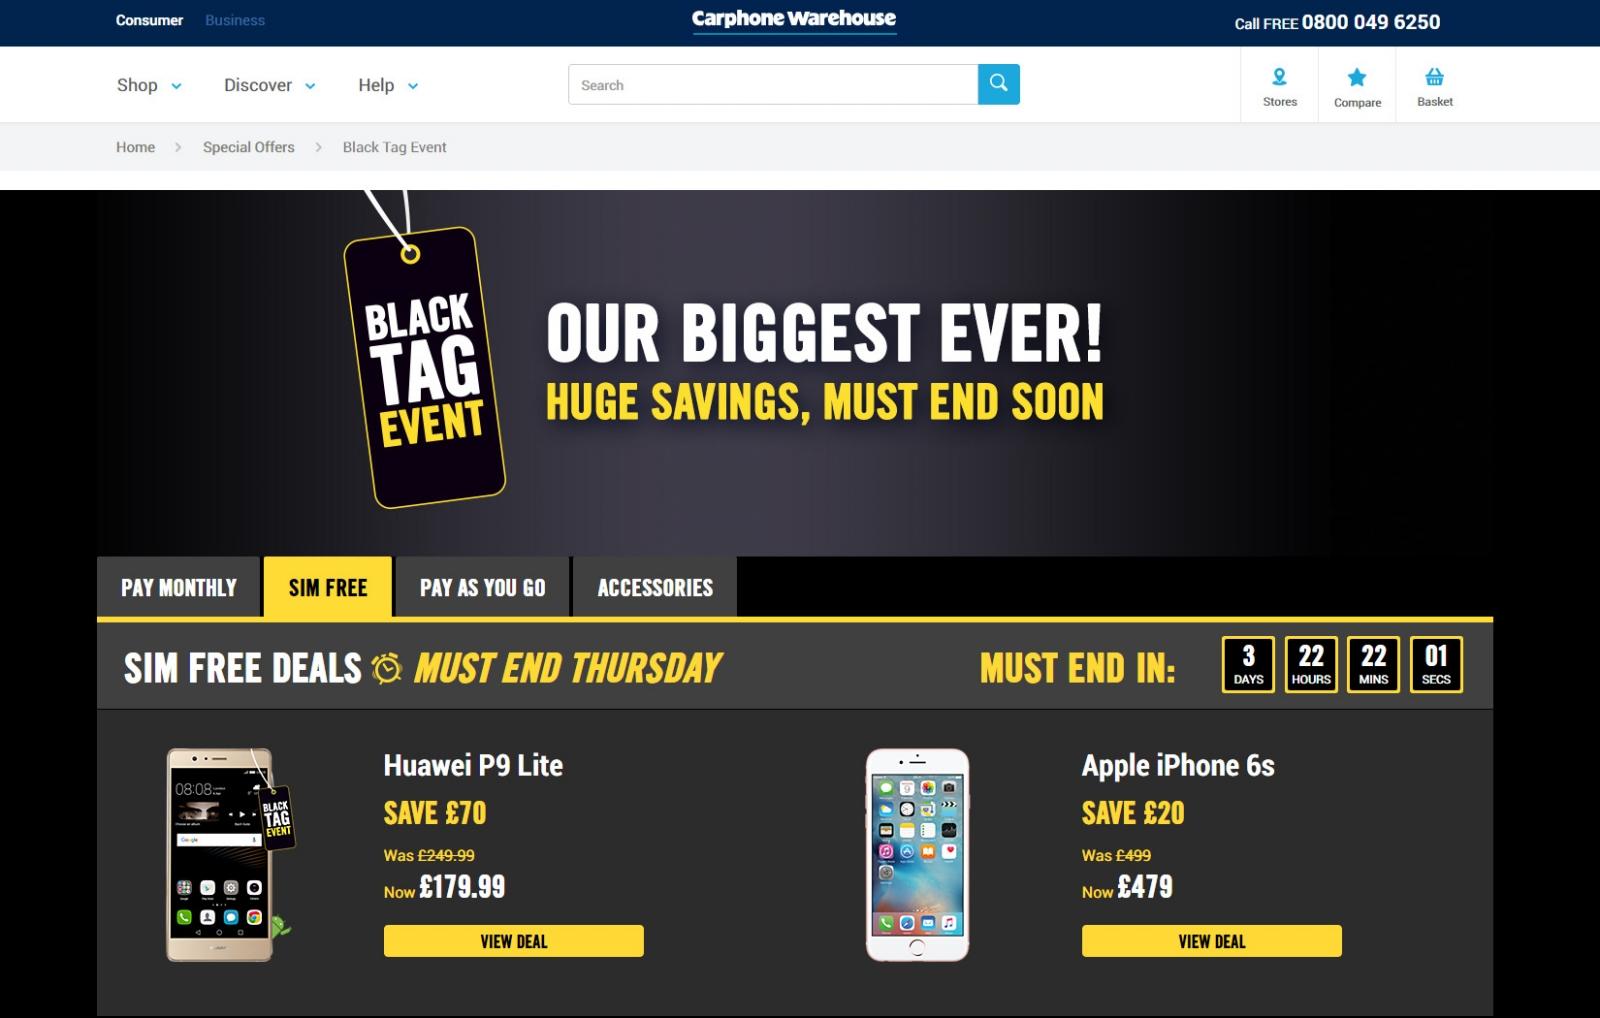 Carphone Warehouse's Black Friday 2016 deals